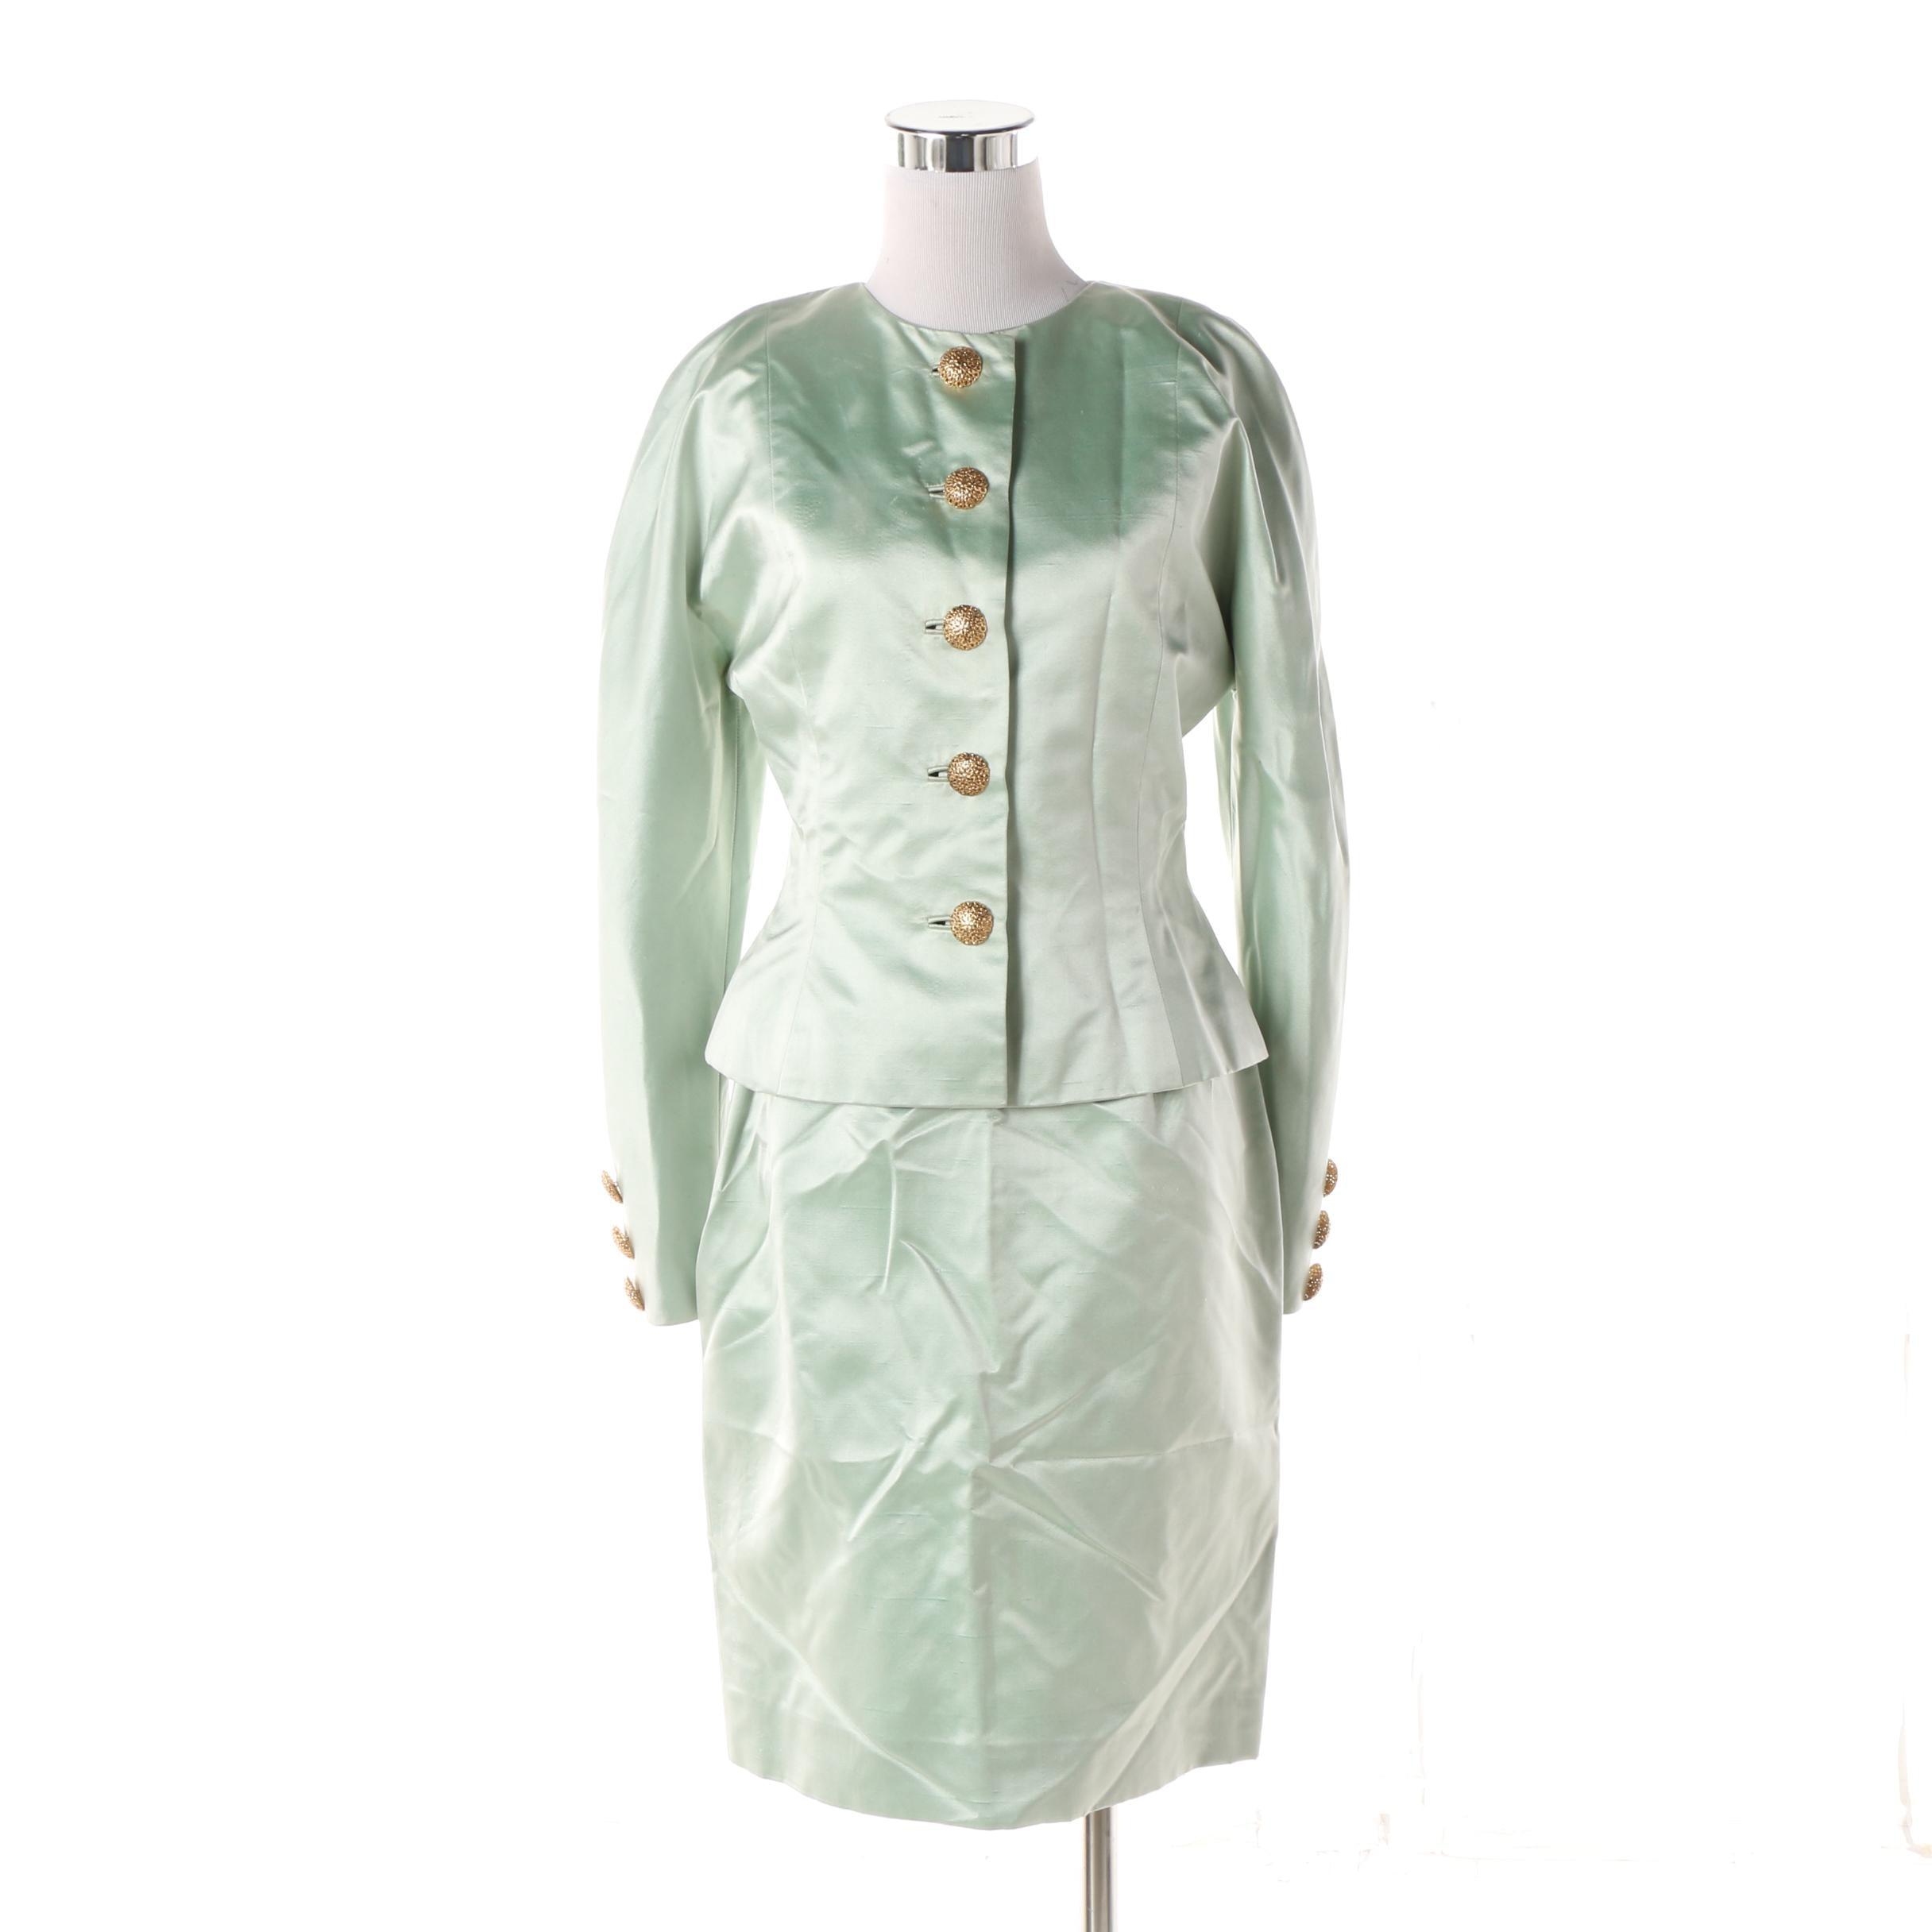 Women's Mid 1970s Vintage Oscar de la Renta Silk Satin Skirt Suit